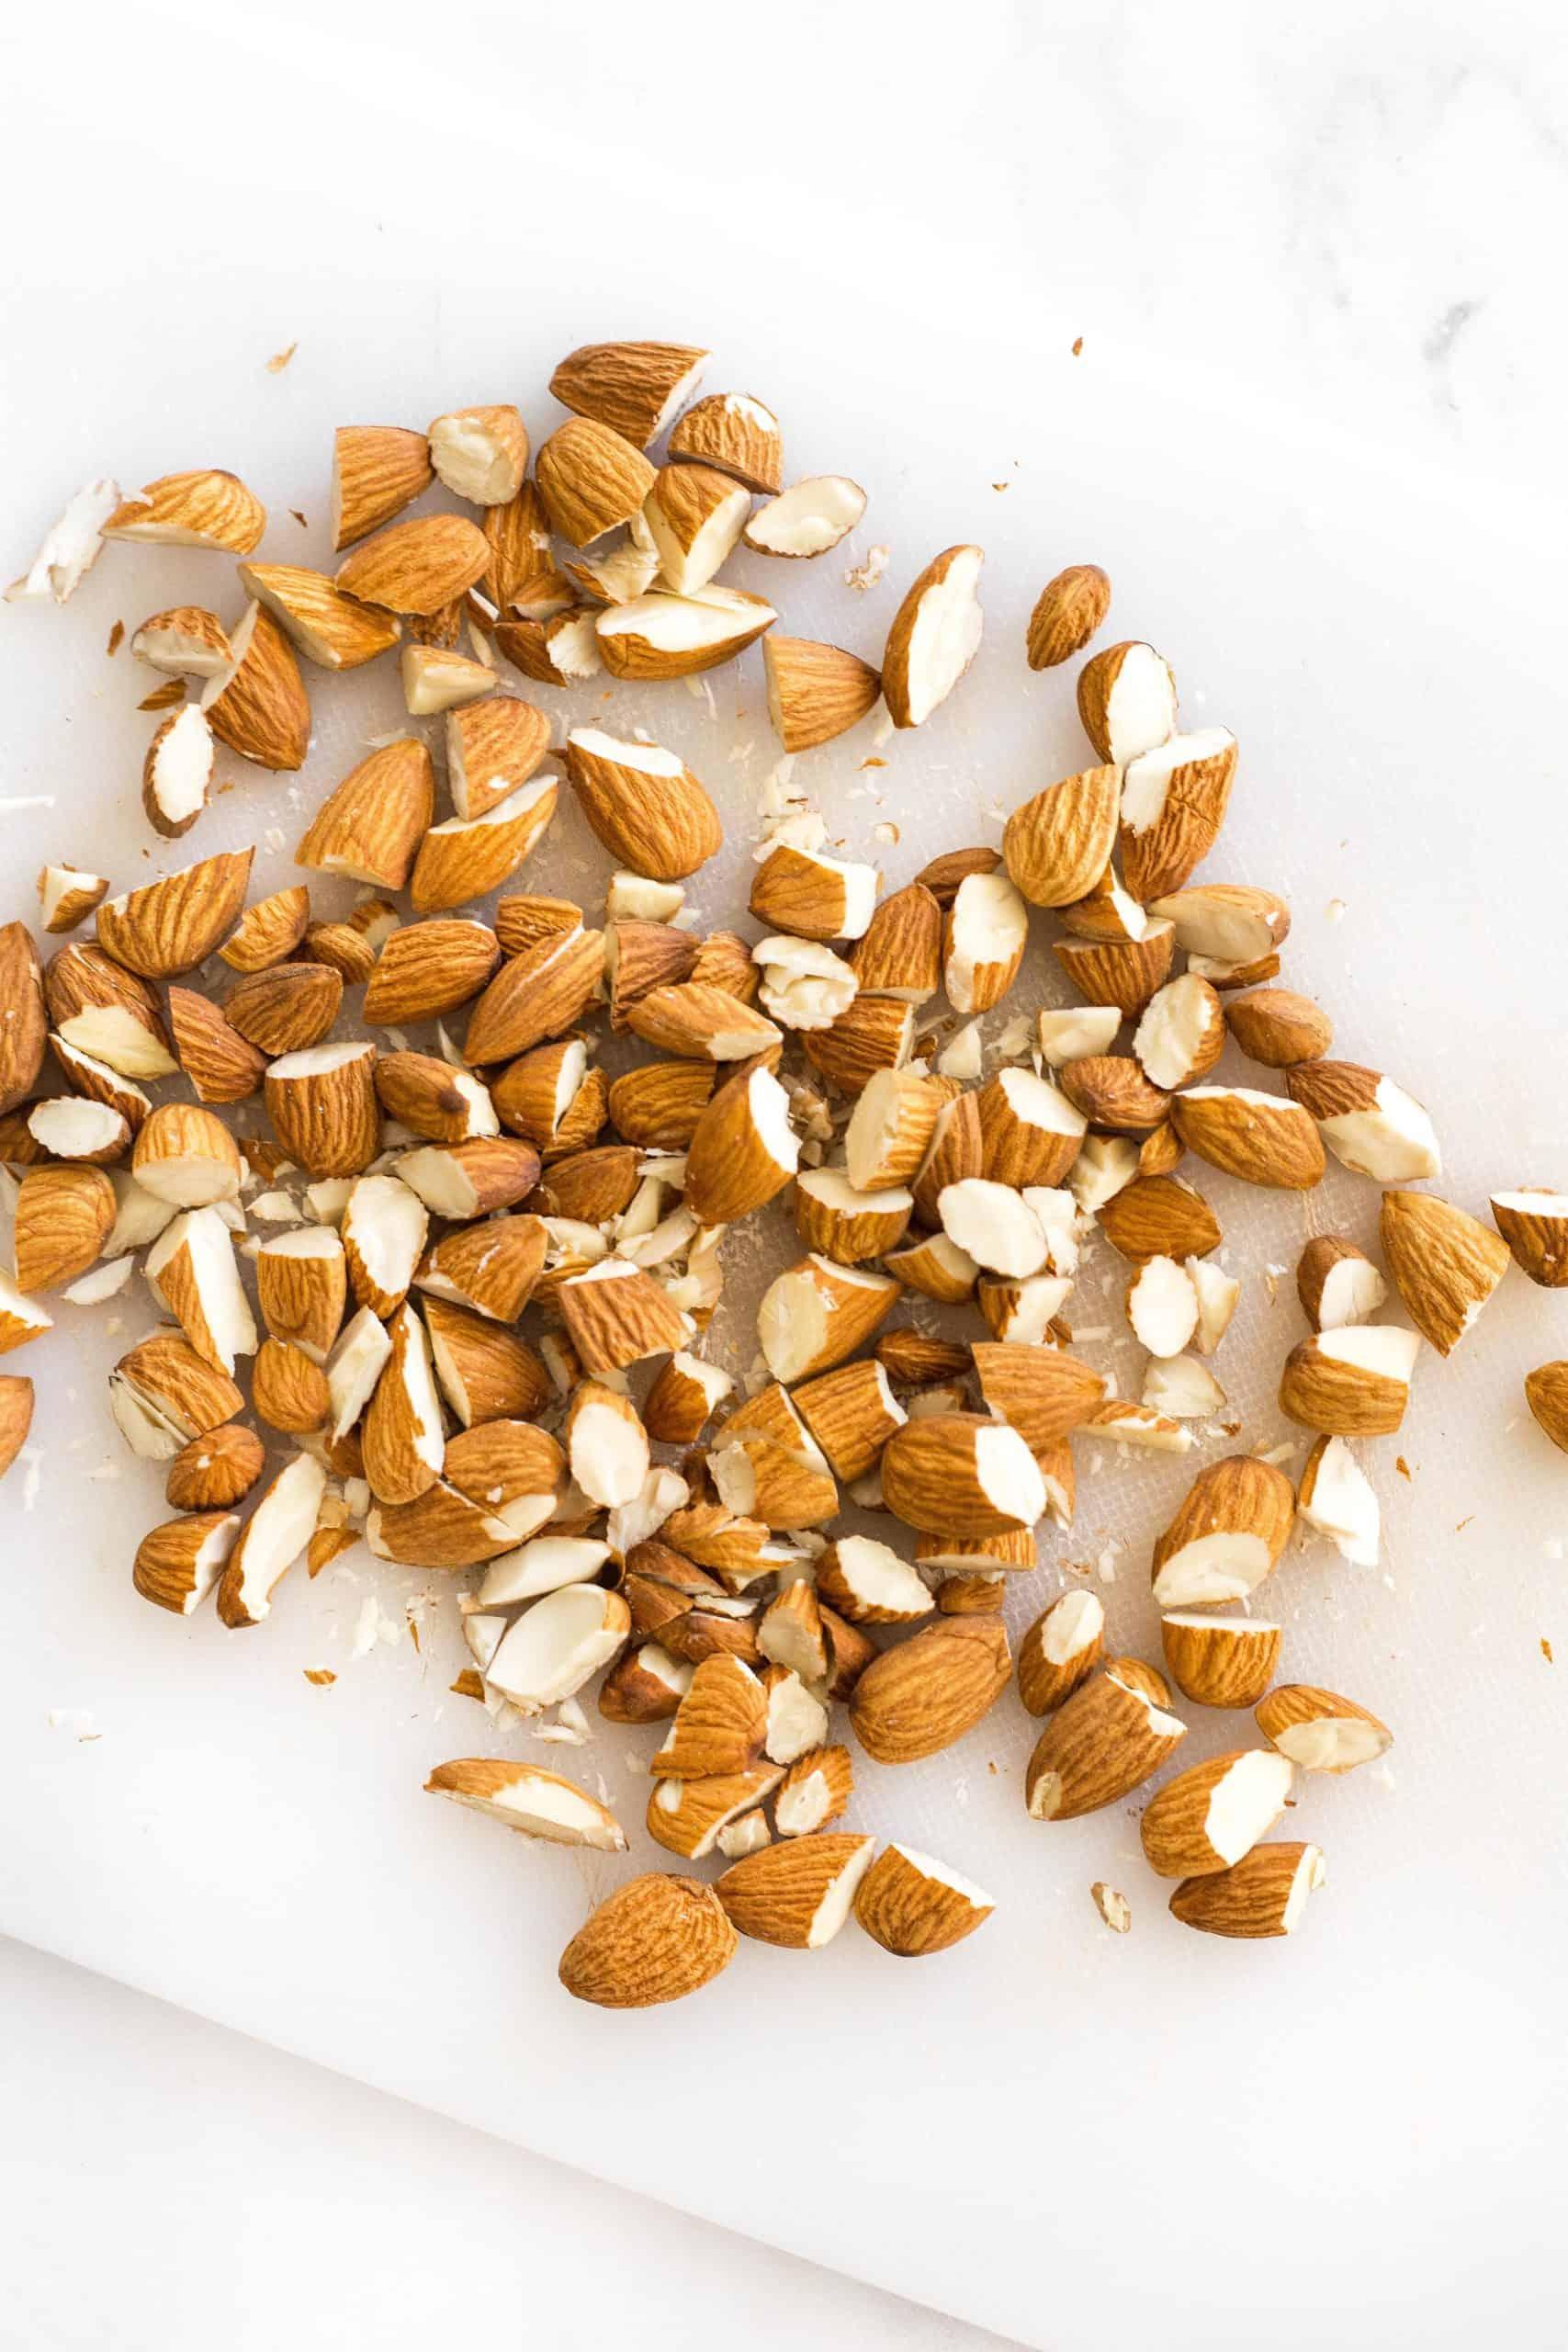 Chopped almonds on a chopping board.